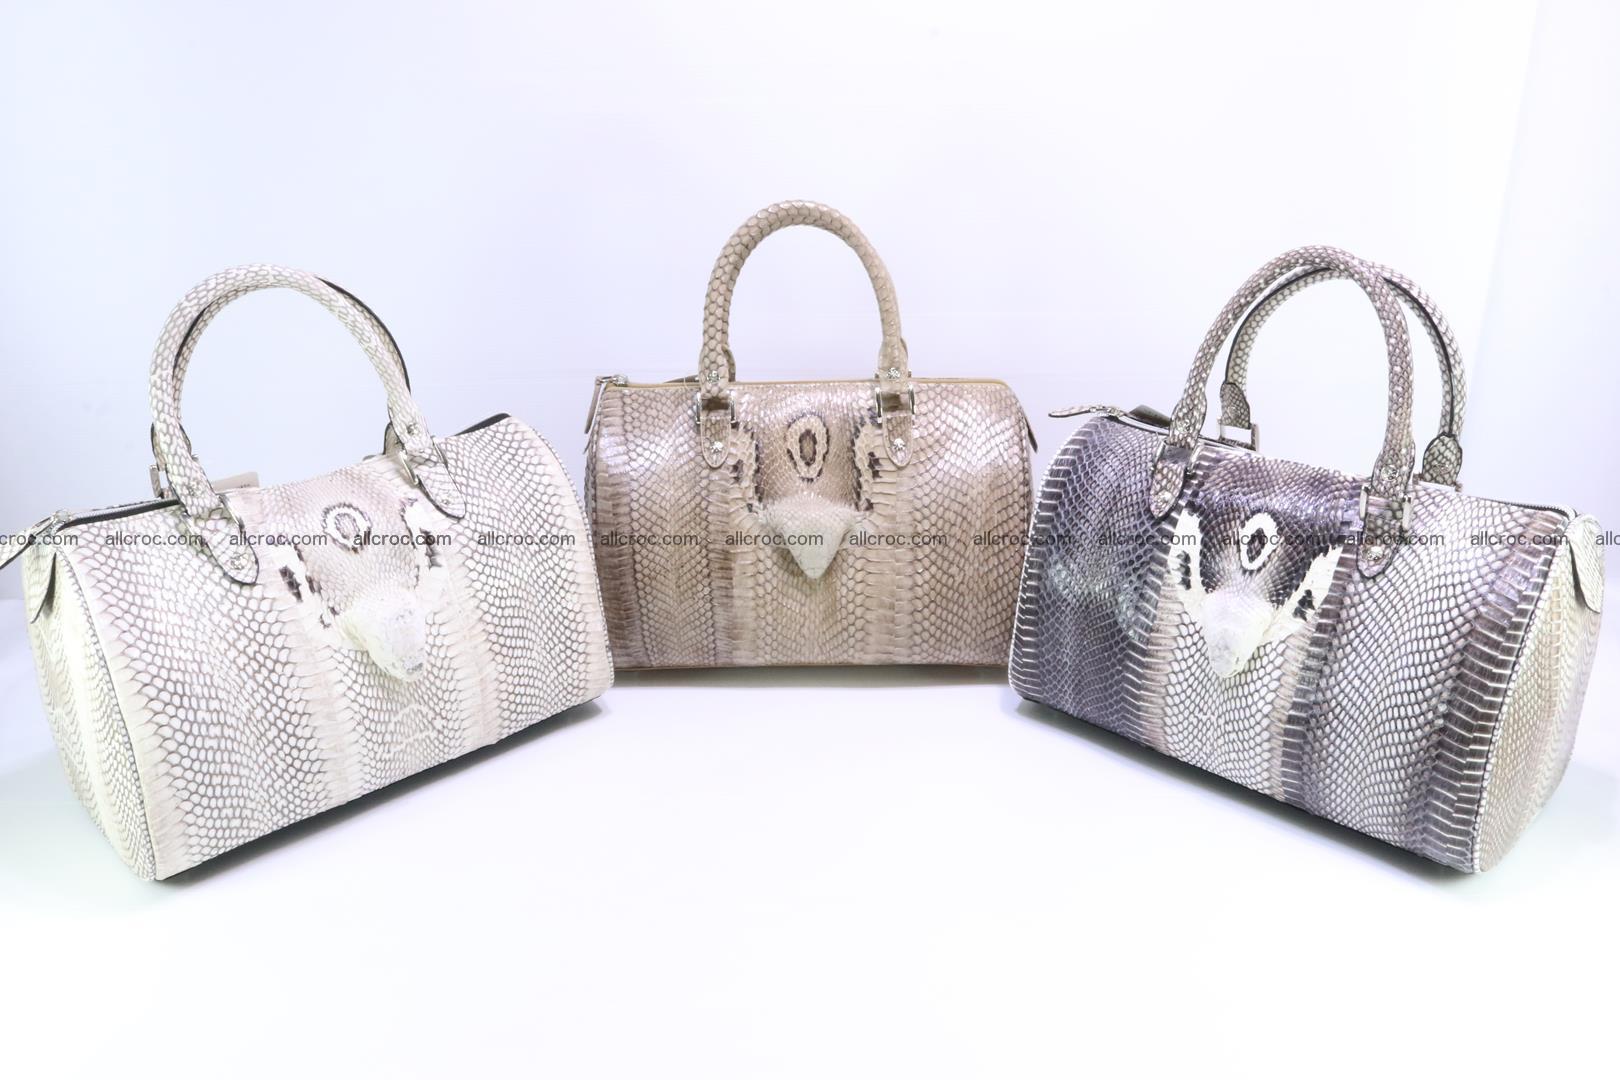 Handbag from cobra skin with head of cobra 171 Foto 14